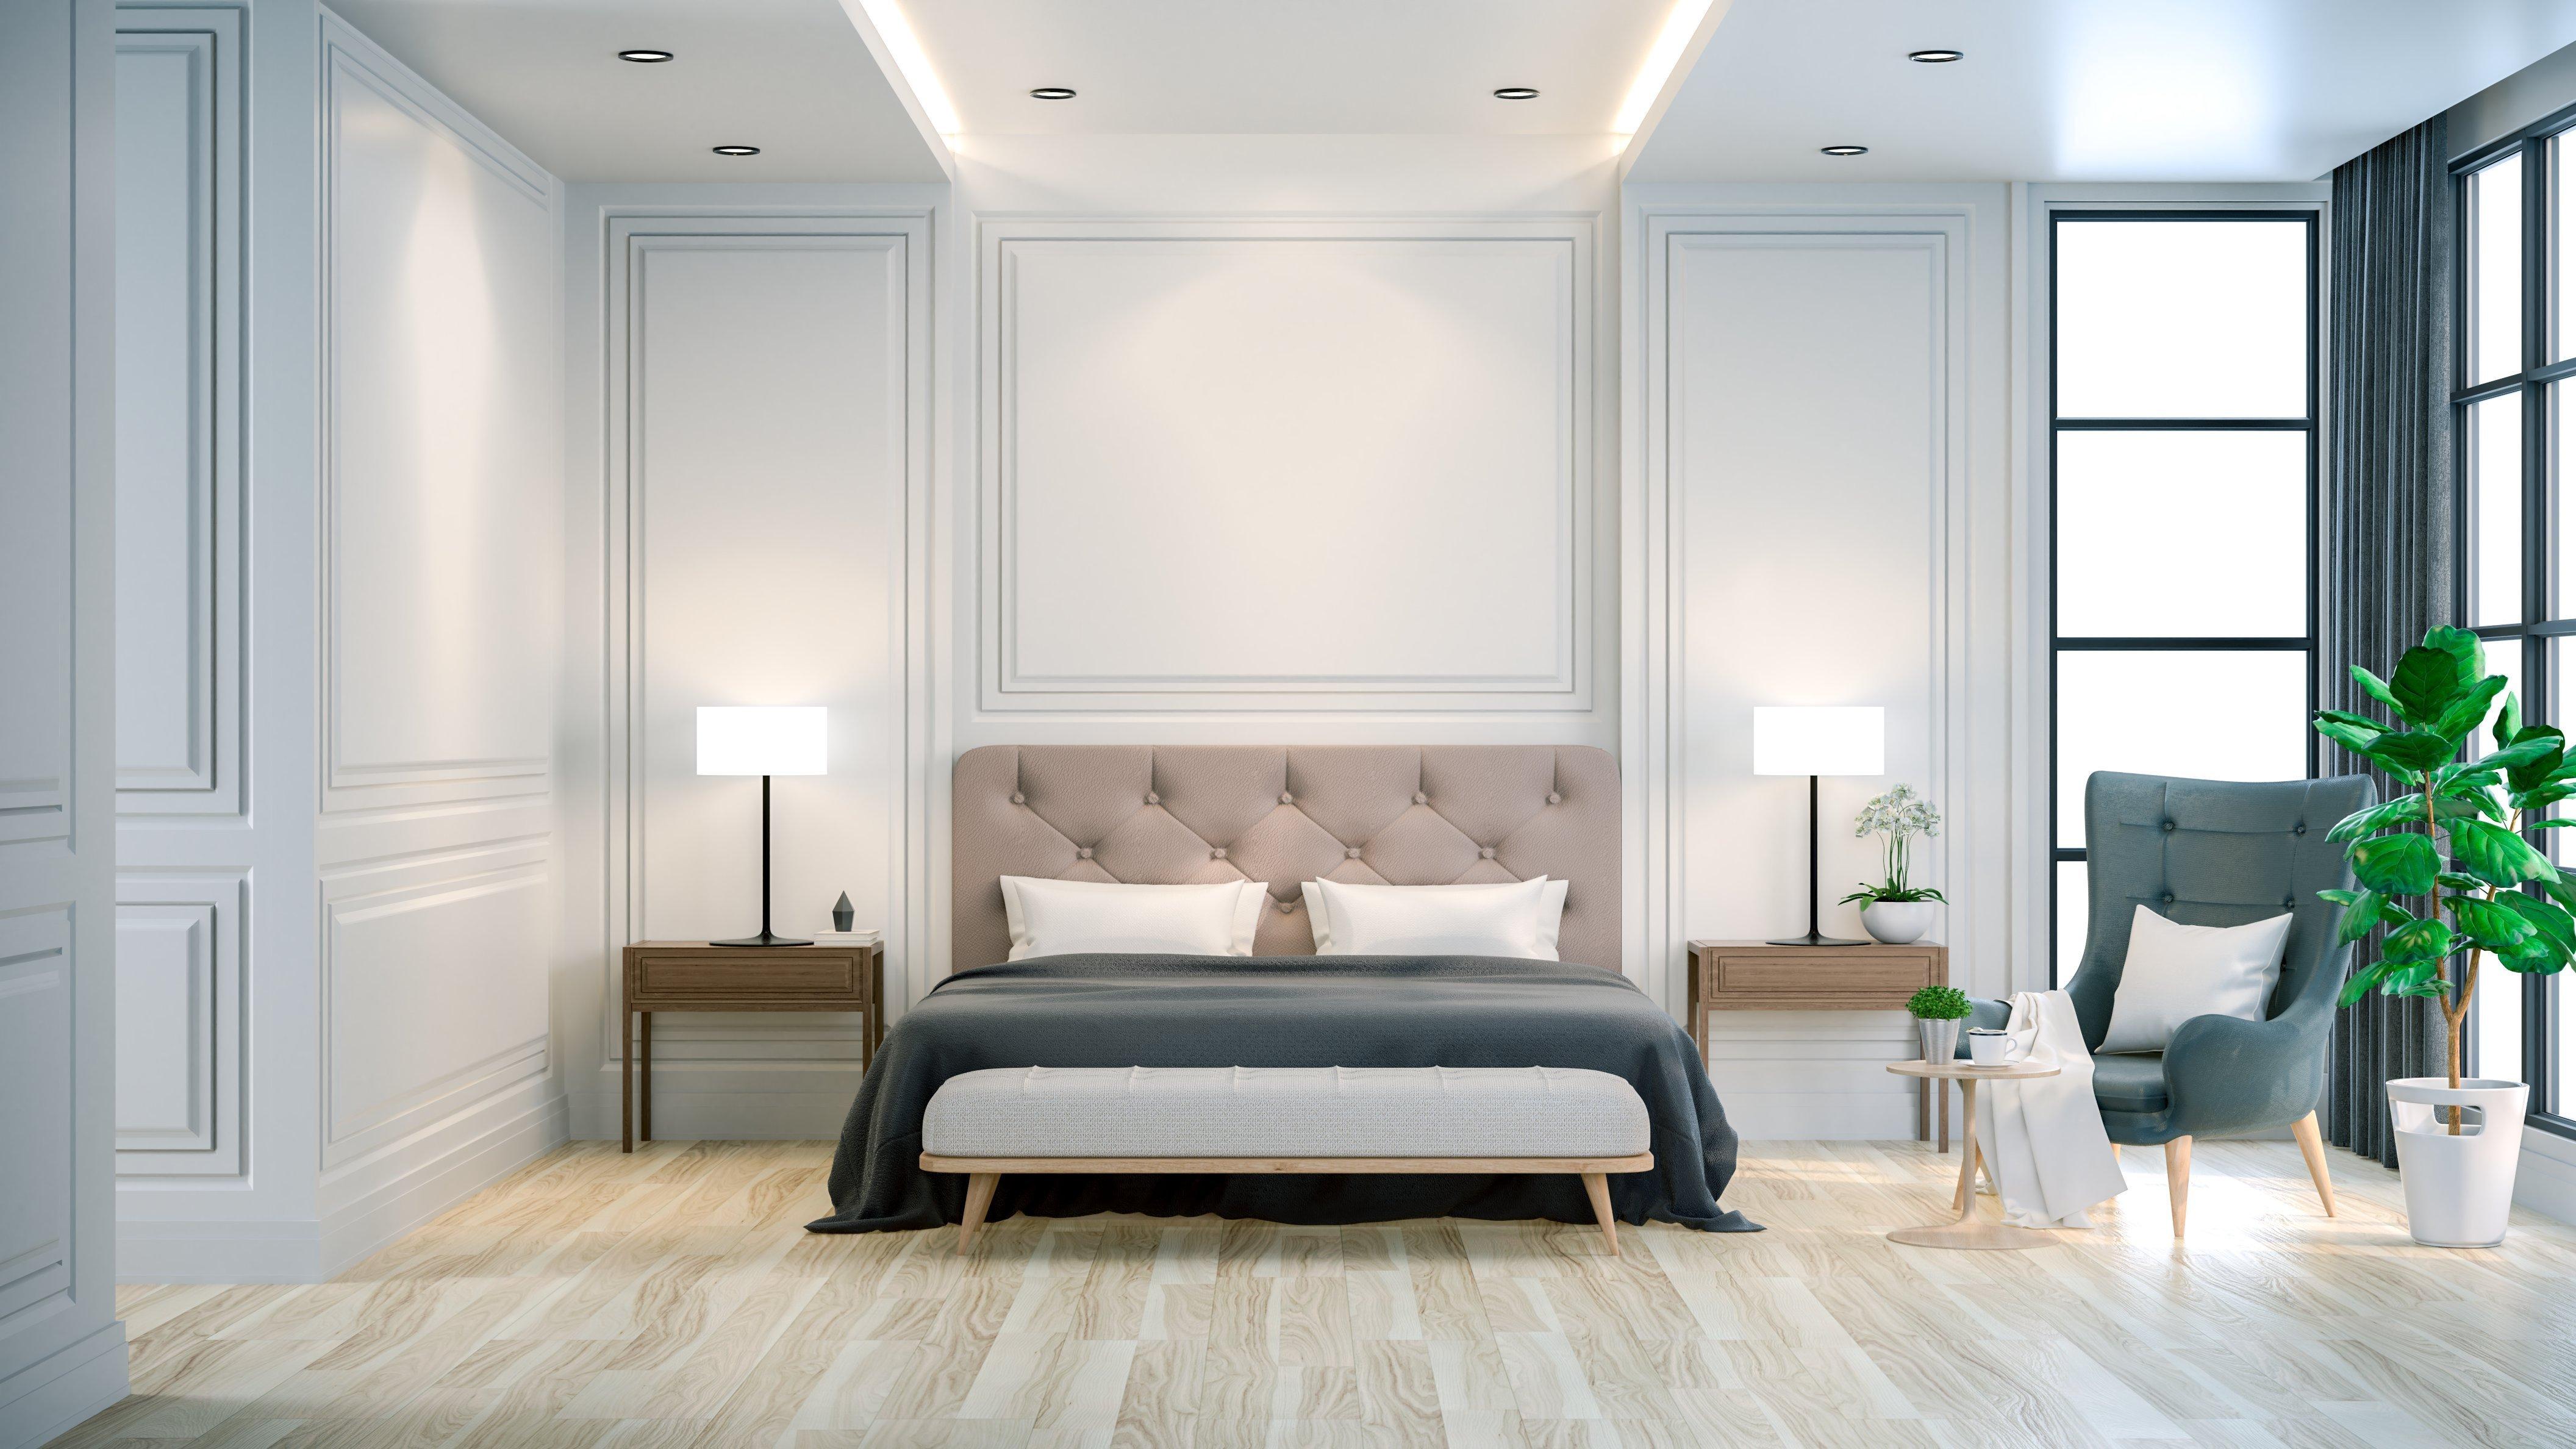 Interior Luxury and Cozy Bedroom with Modern Decor